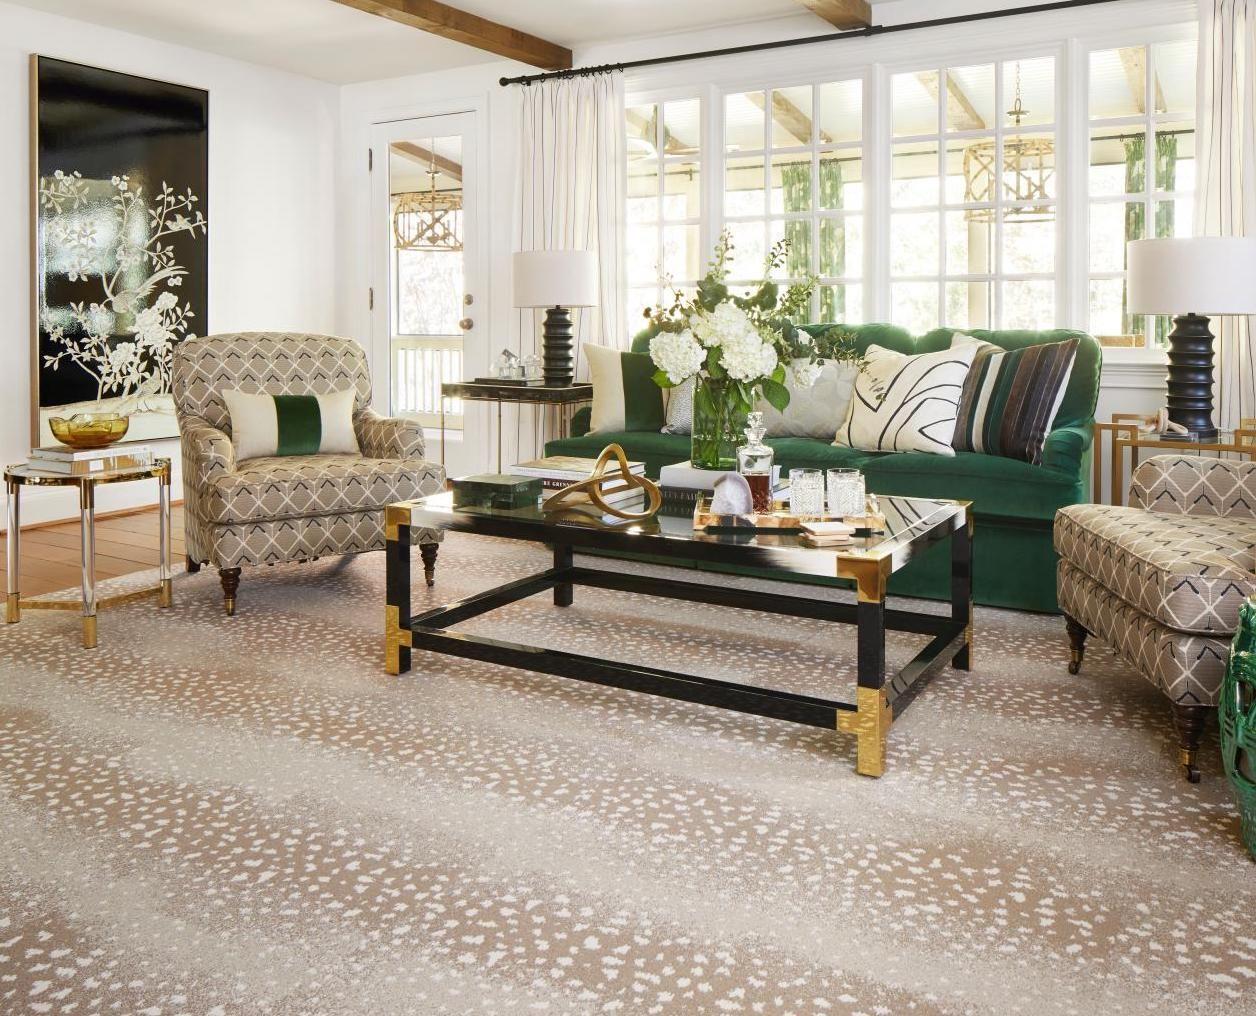 Doe Re Mi In 2020 Carpet Tiles Living Room Inspiration Room